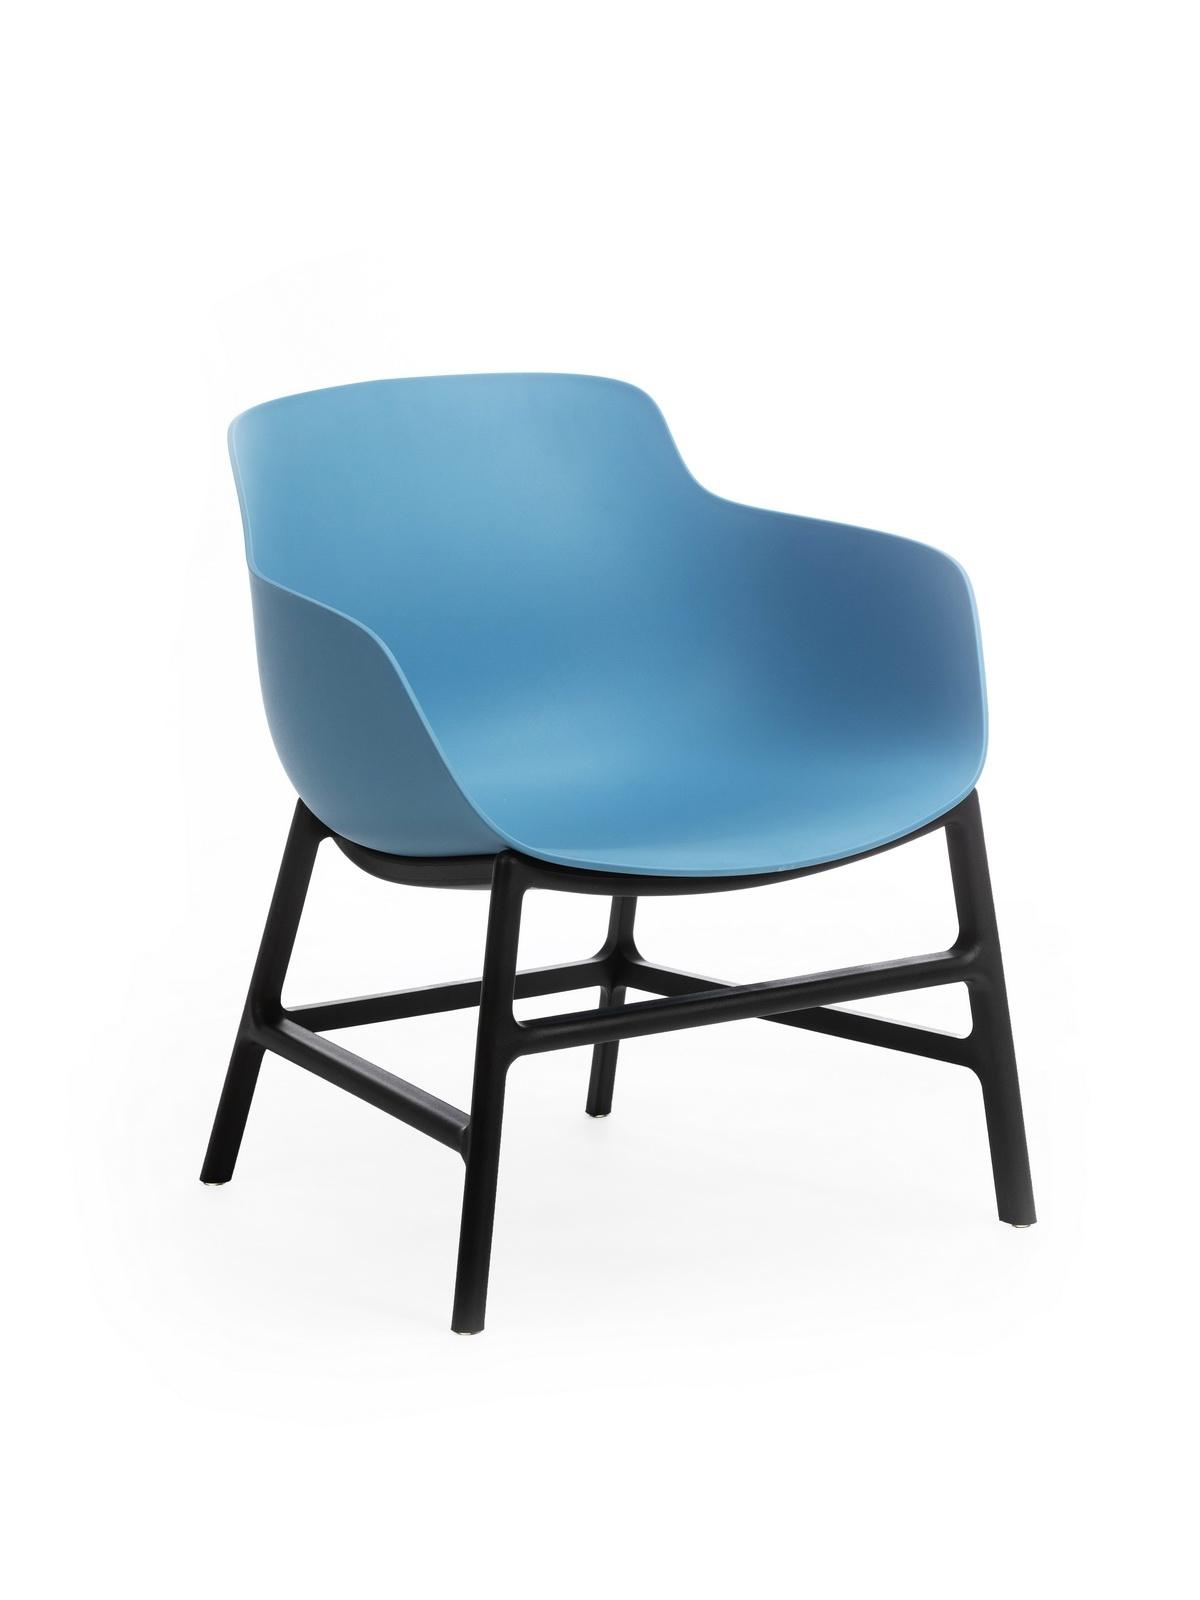 Scaun din plastic Ines Albastru / Negru, l63xA62xH70 cm